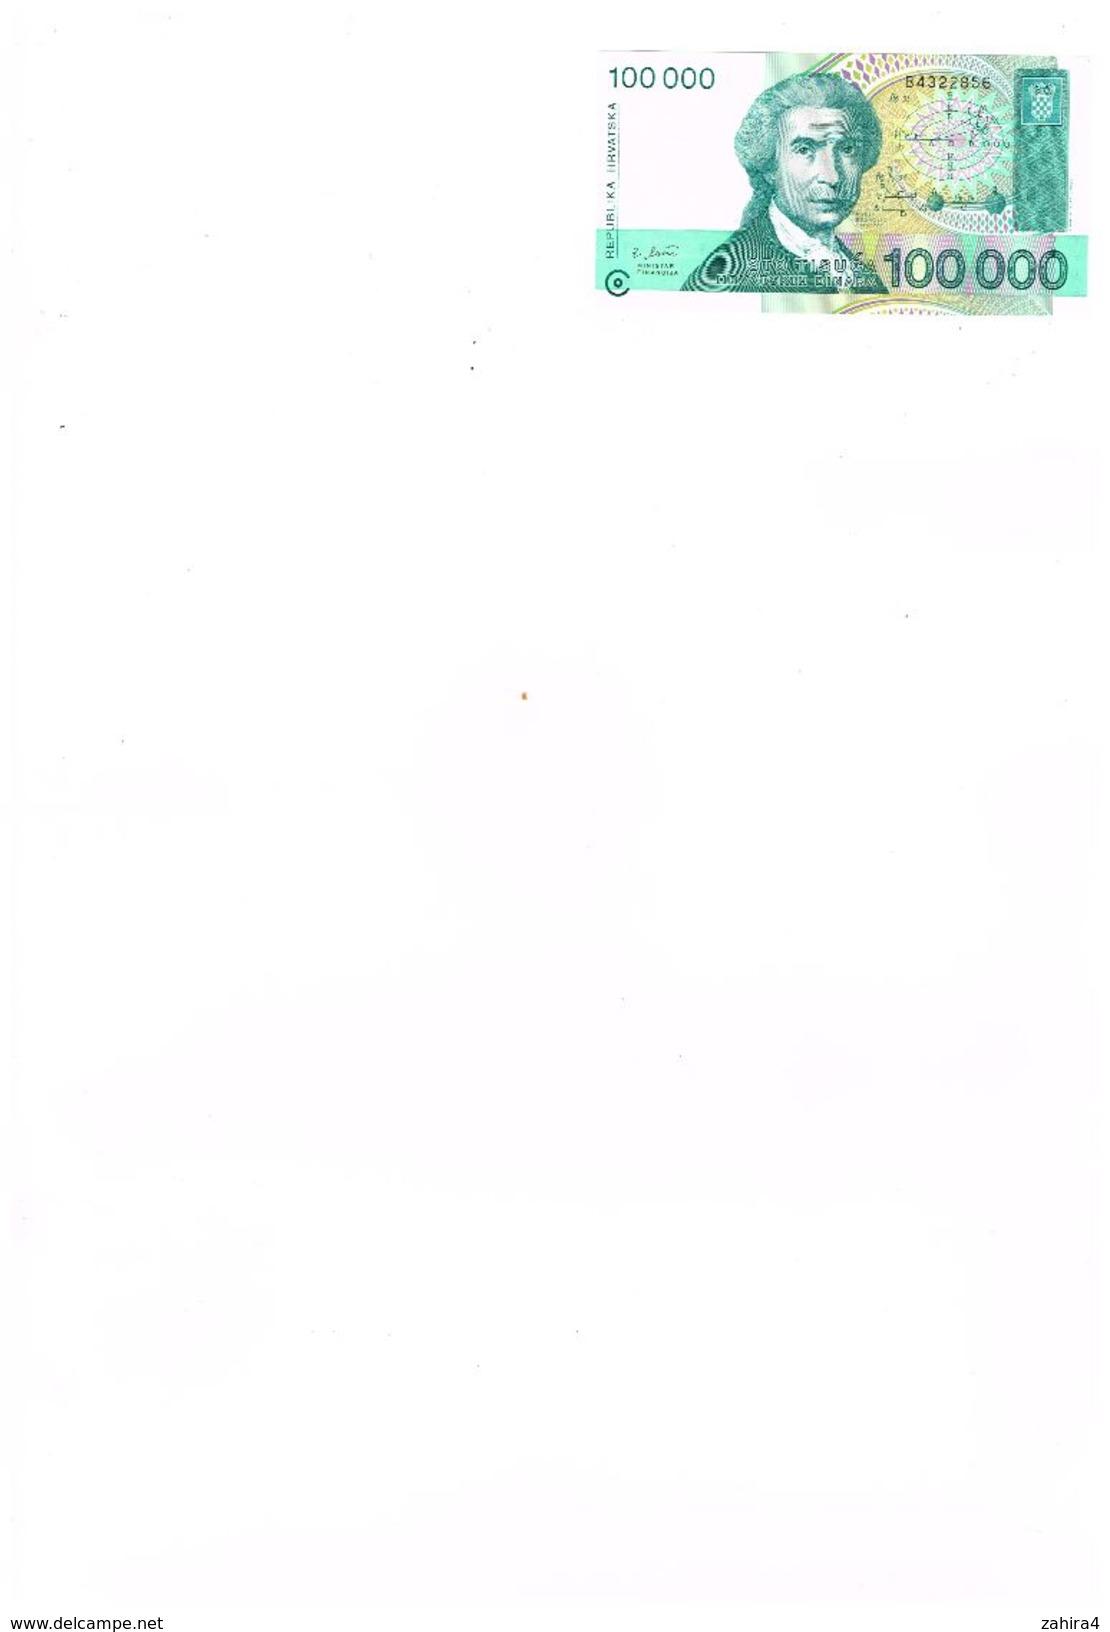 Republika Hrvatska Zagreb 30 Svibnja 1993 - 100000 - Ruber Boscovic - Croatia